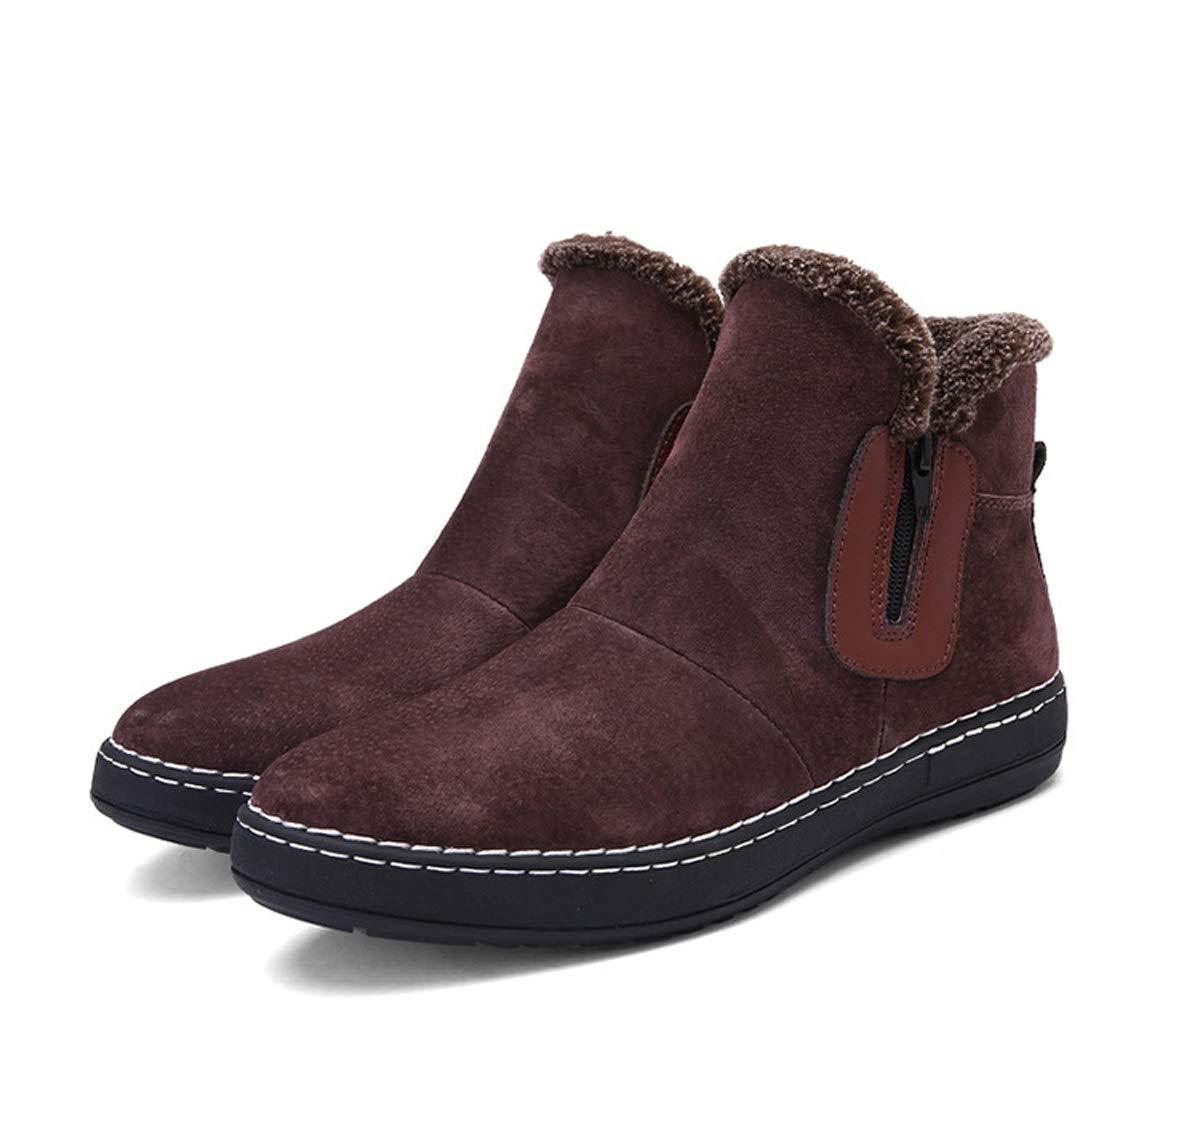 Adong Mens Stiefel Walking Stiefel Men Slipper Stiefel Faux Fur Water Resistant schuhe Suede Slip on Stiefel,braun,43EU